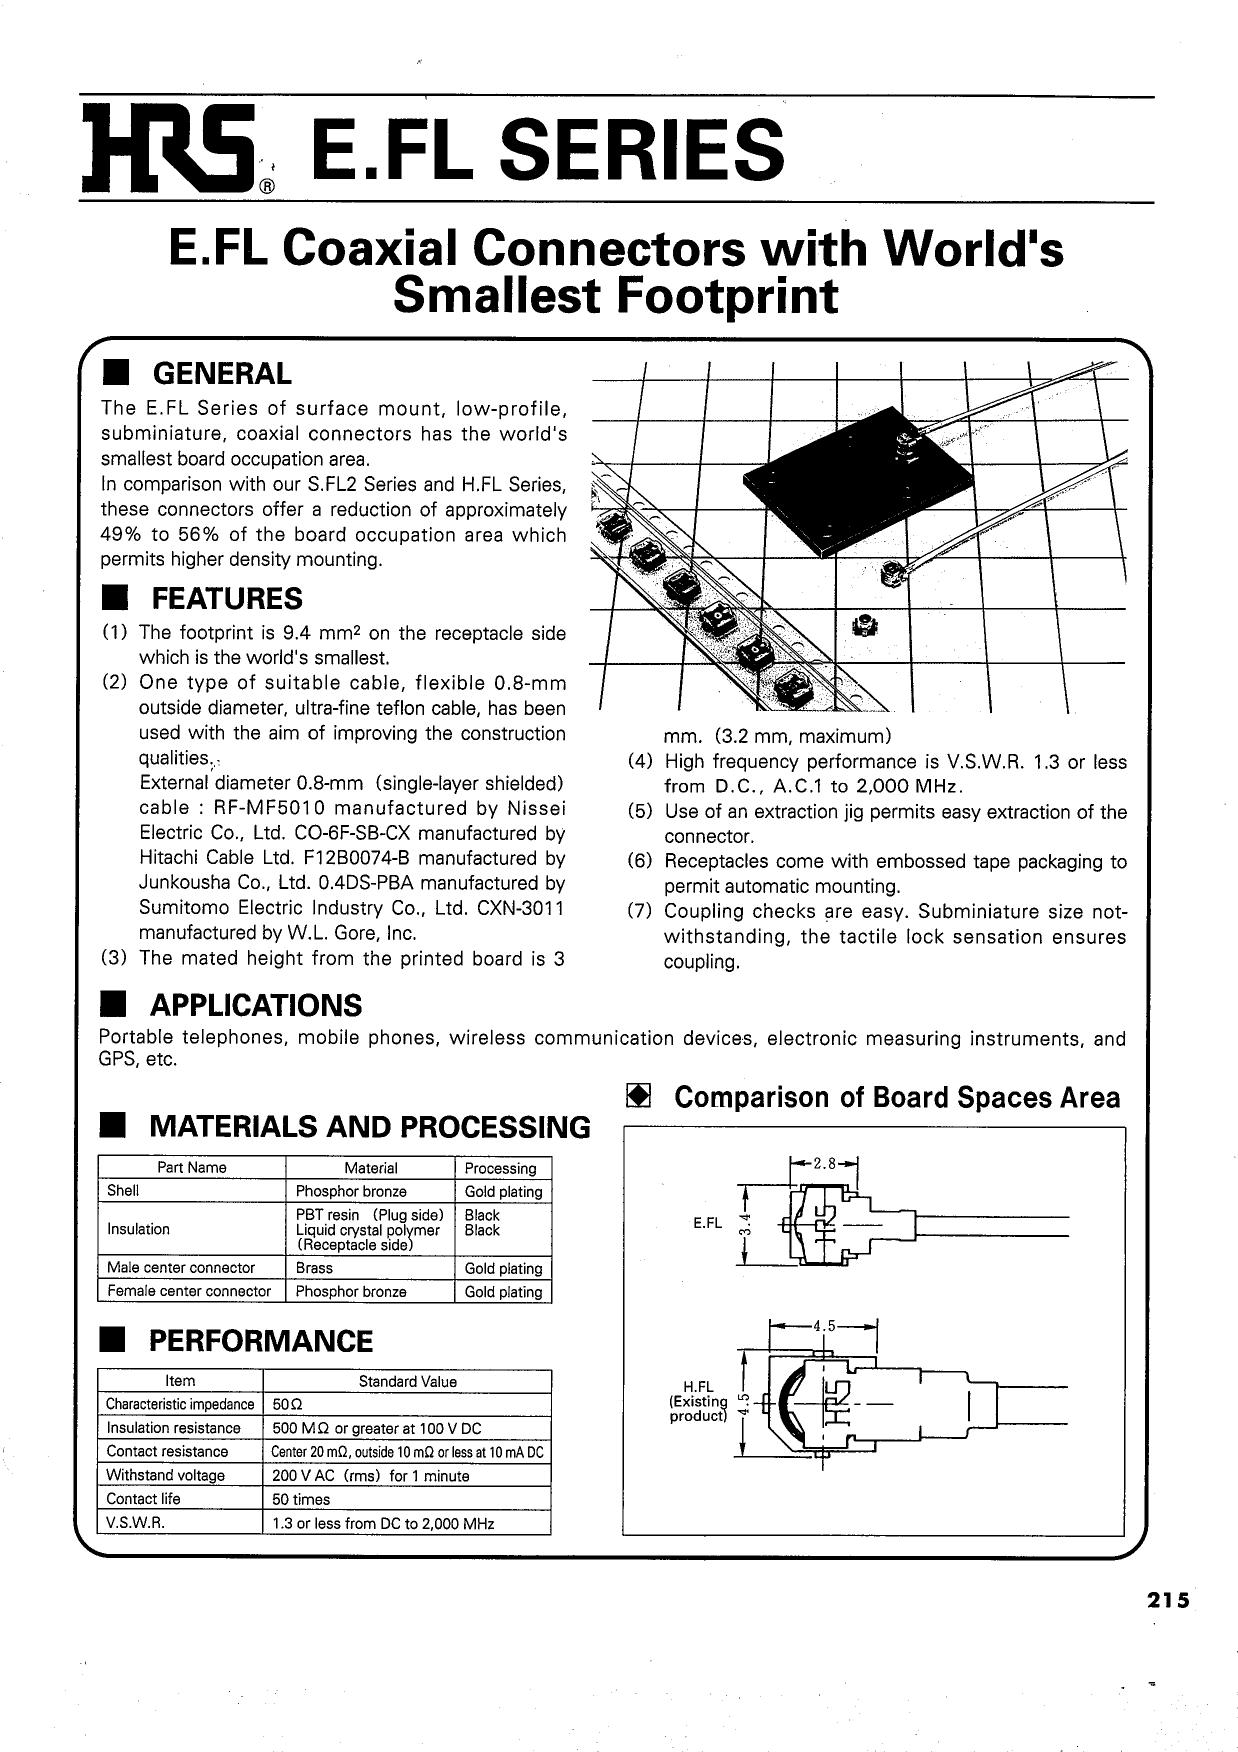 E.FL-R-1 datasheet